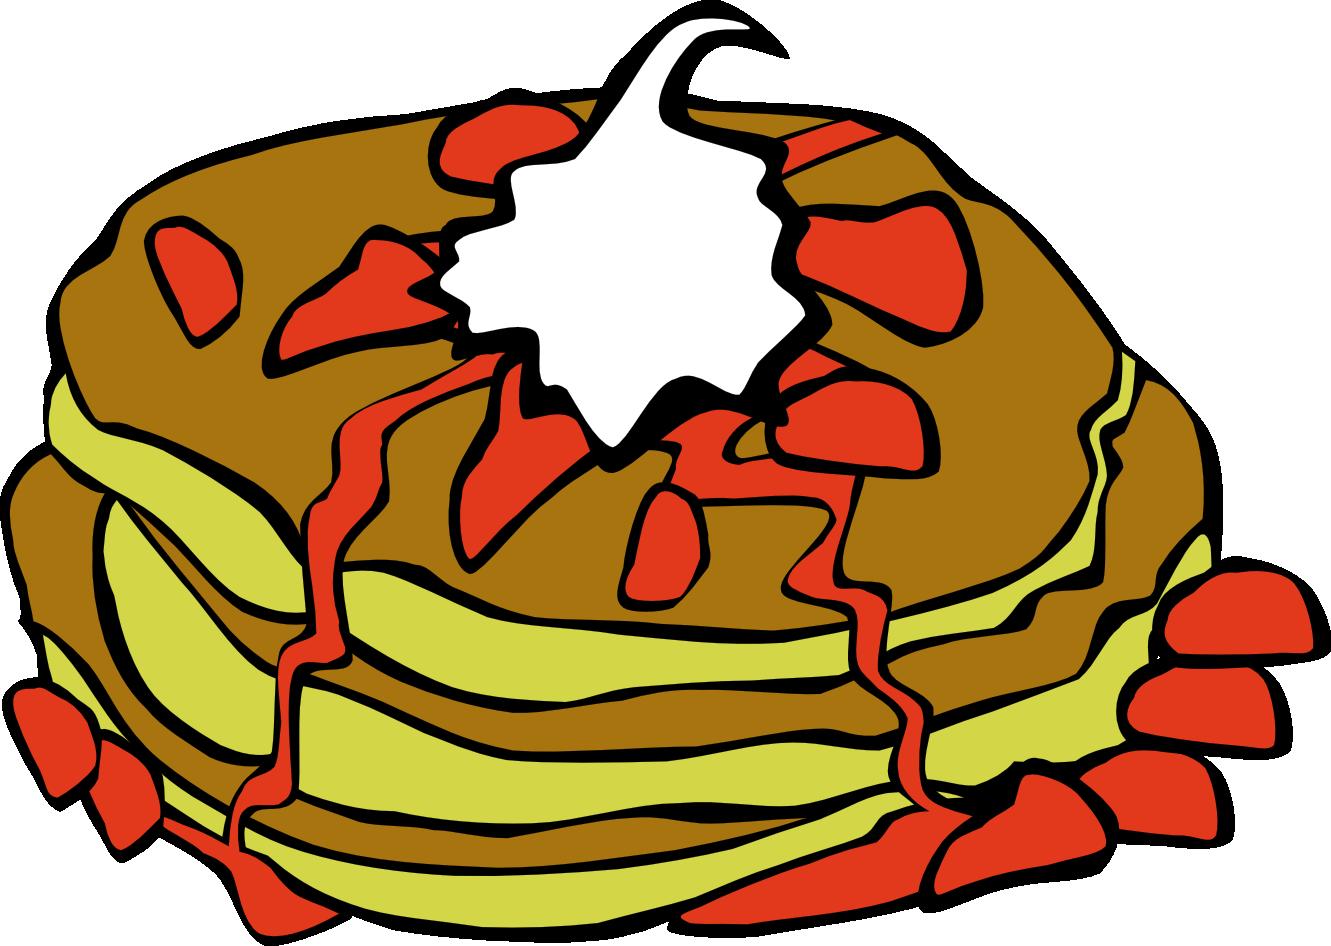 Breakfast clipart animated Panda Free breakfast%20clipart Clipart Clipart